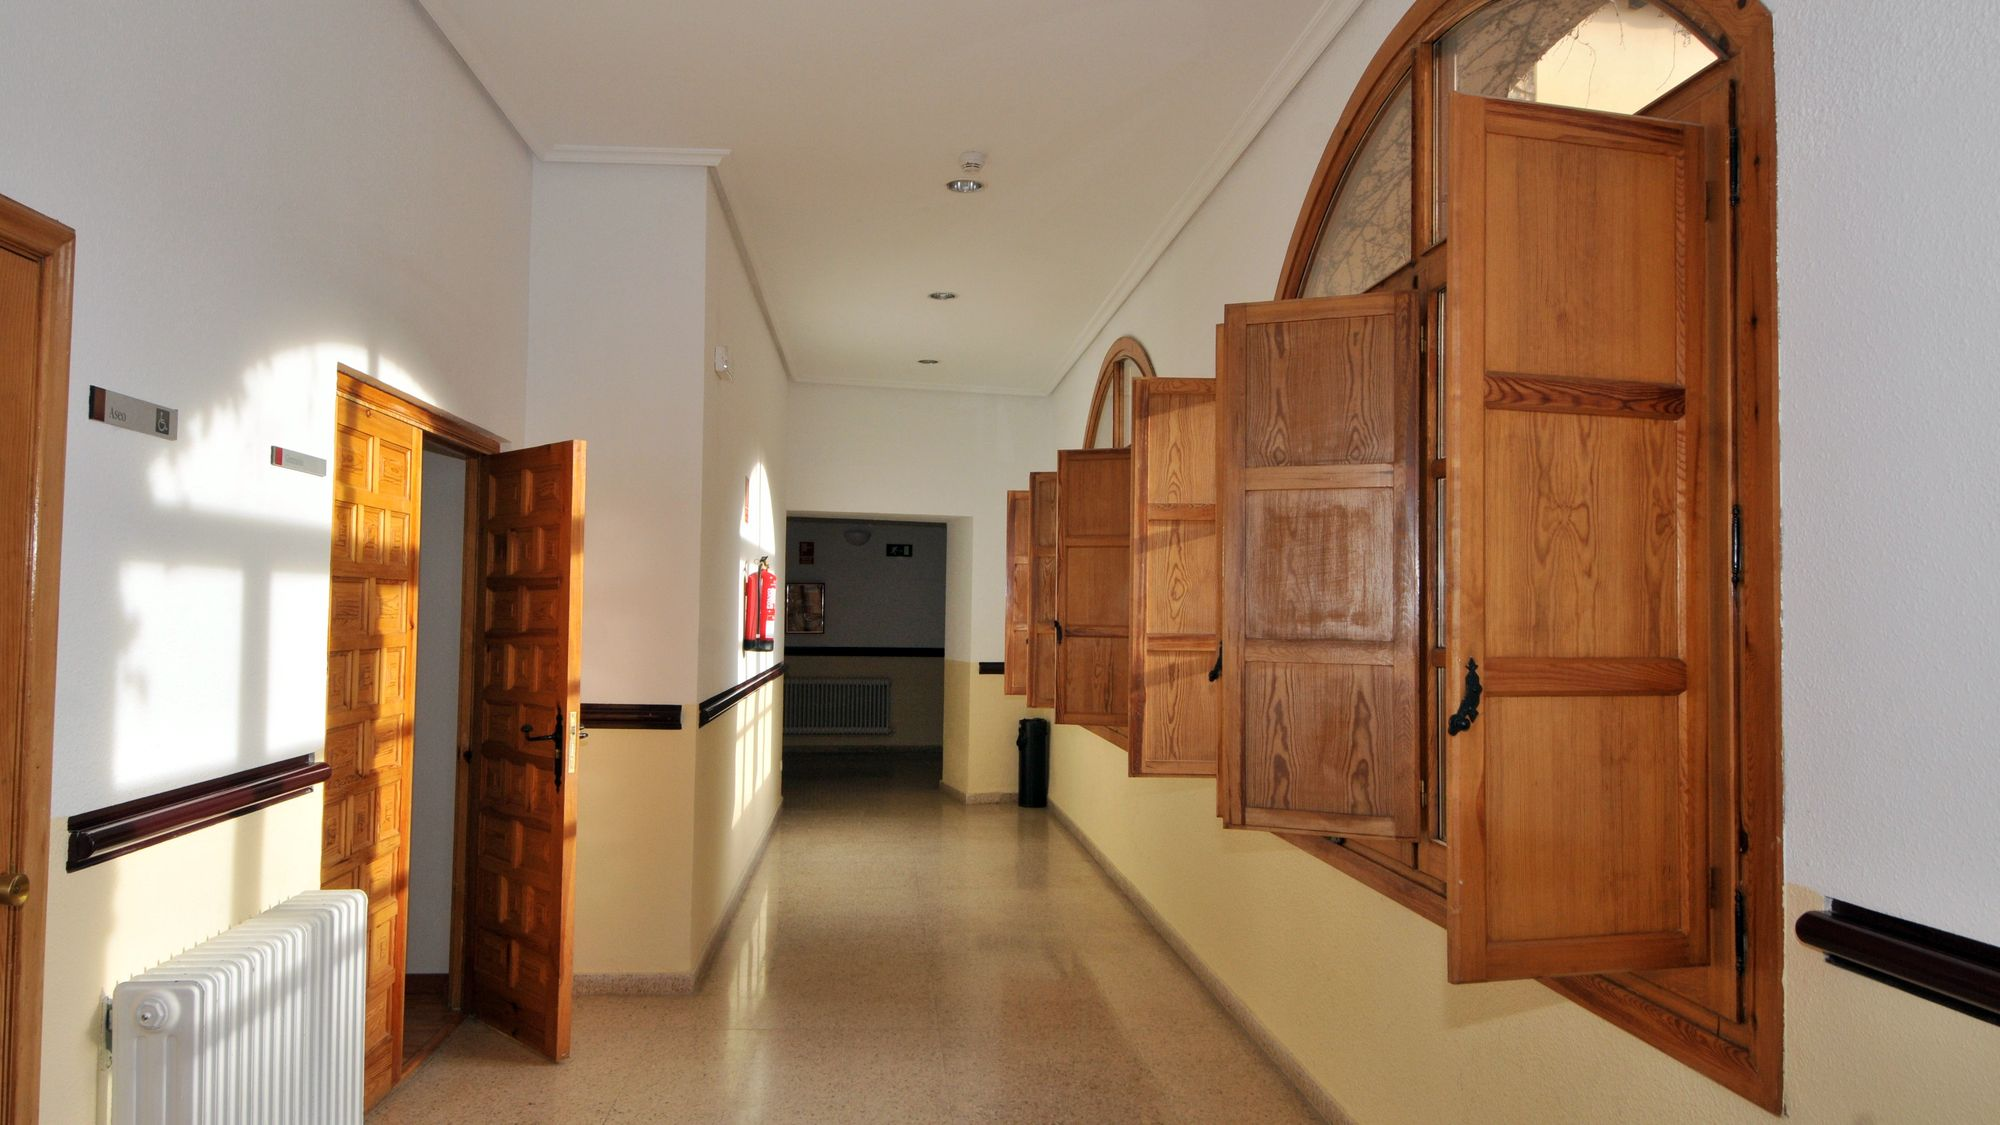 https://funge.uva.es/wp-content/uploads/2020/12/Pasillo-Residencia-Duques-de-Soria-Universidad-de-Valladolid1.jpg